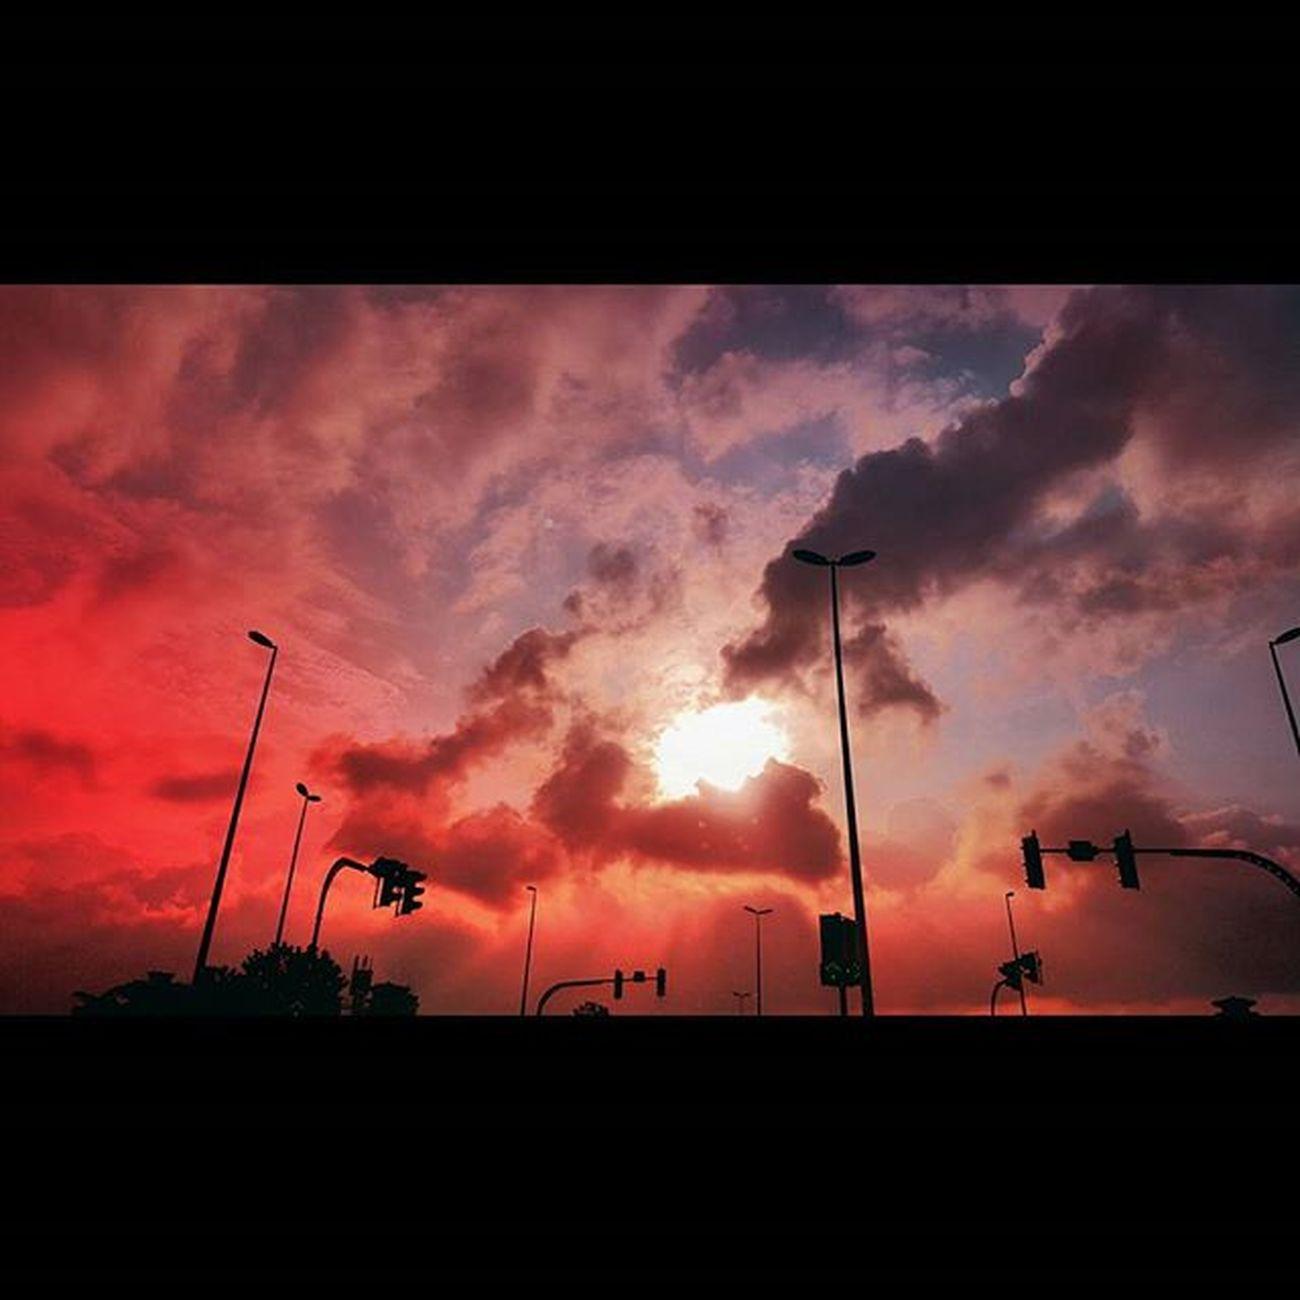 i t ' s s o w a r m Biakkch Tya714 Tyaeze Borneoboy Borneoislandproject Streettogether Awesomeglobe Igersmalaysia Igersone Igers Igersxmalaya Ikutcarakita @borneophoto_hunter @igersmalaysia @igersxmalaya